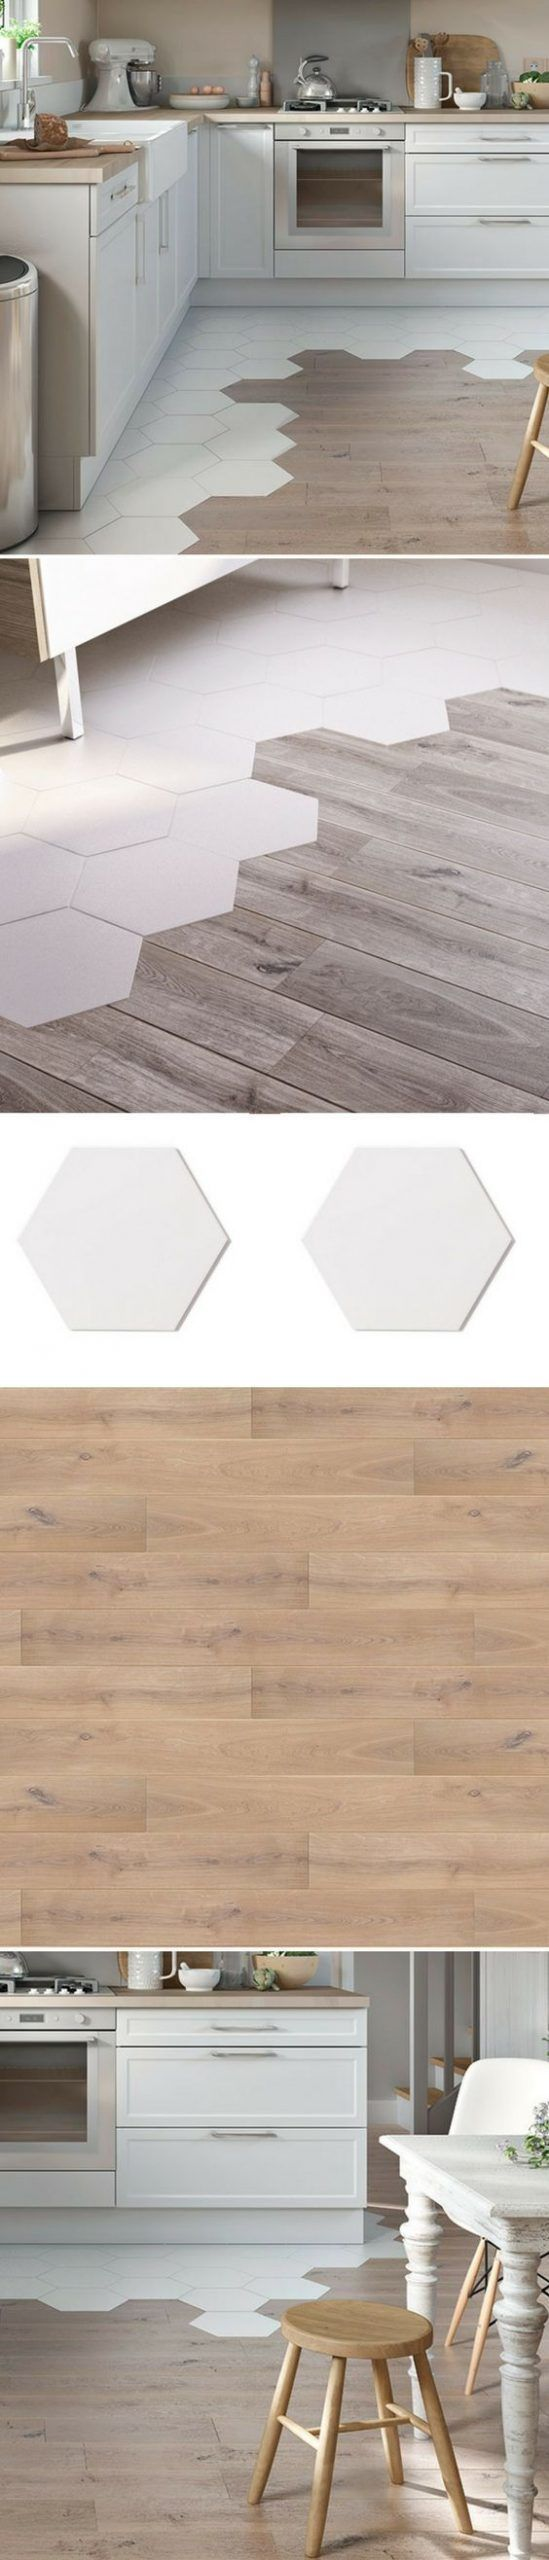 Einrichtungsideen Kuche Kuchenboden Fliesen Und Holz Fliesenboden Haus Deko Holz Interieur